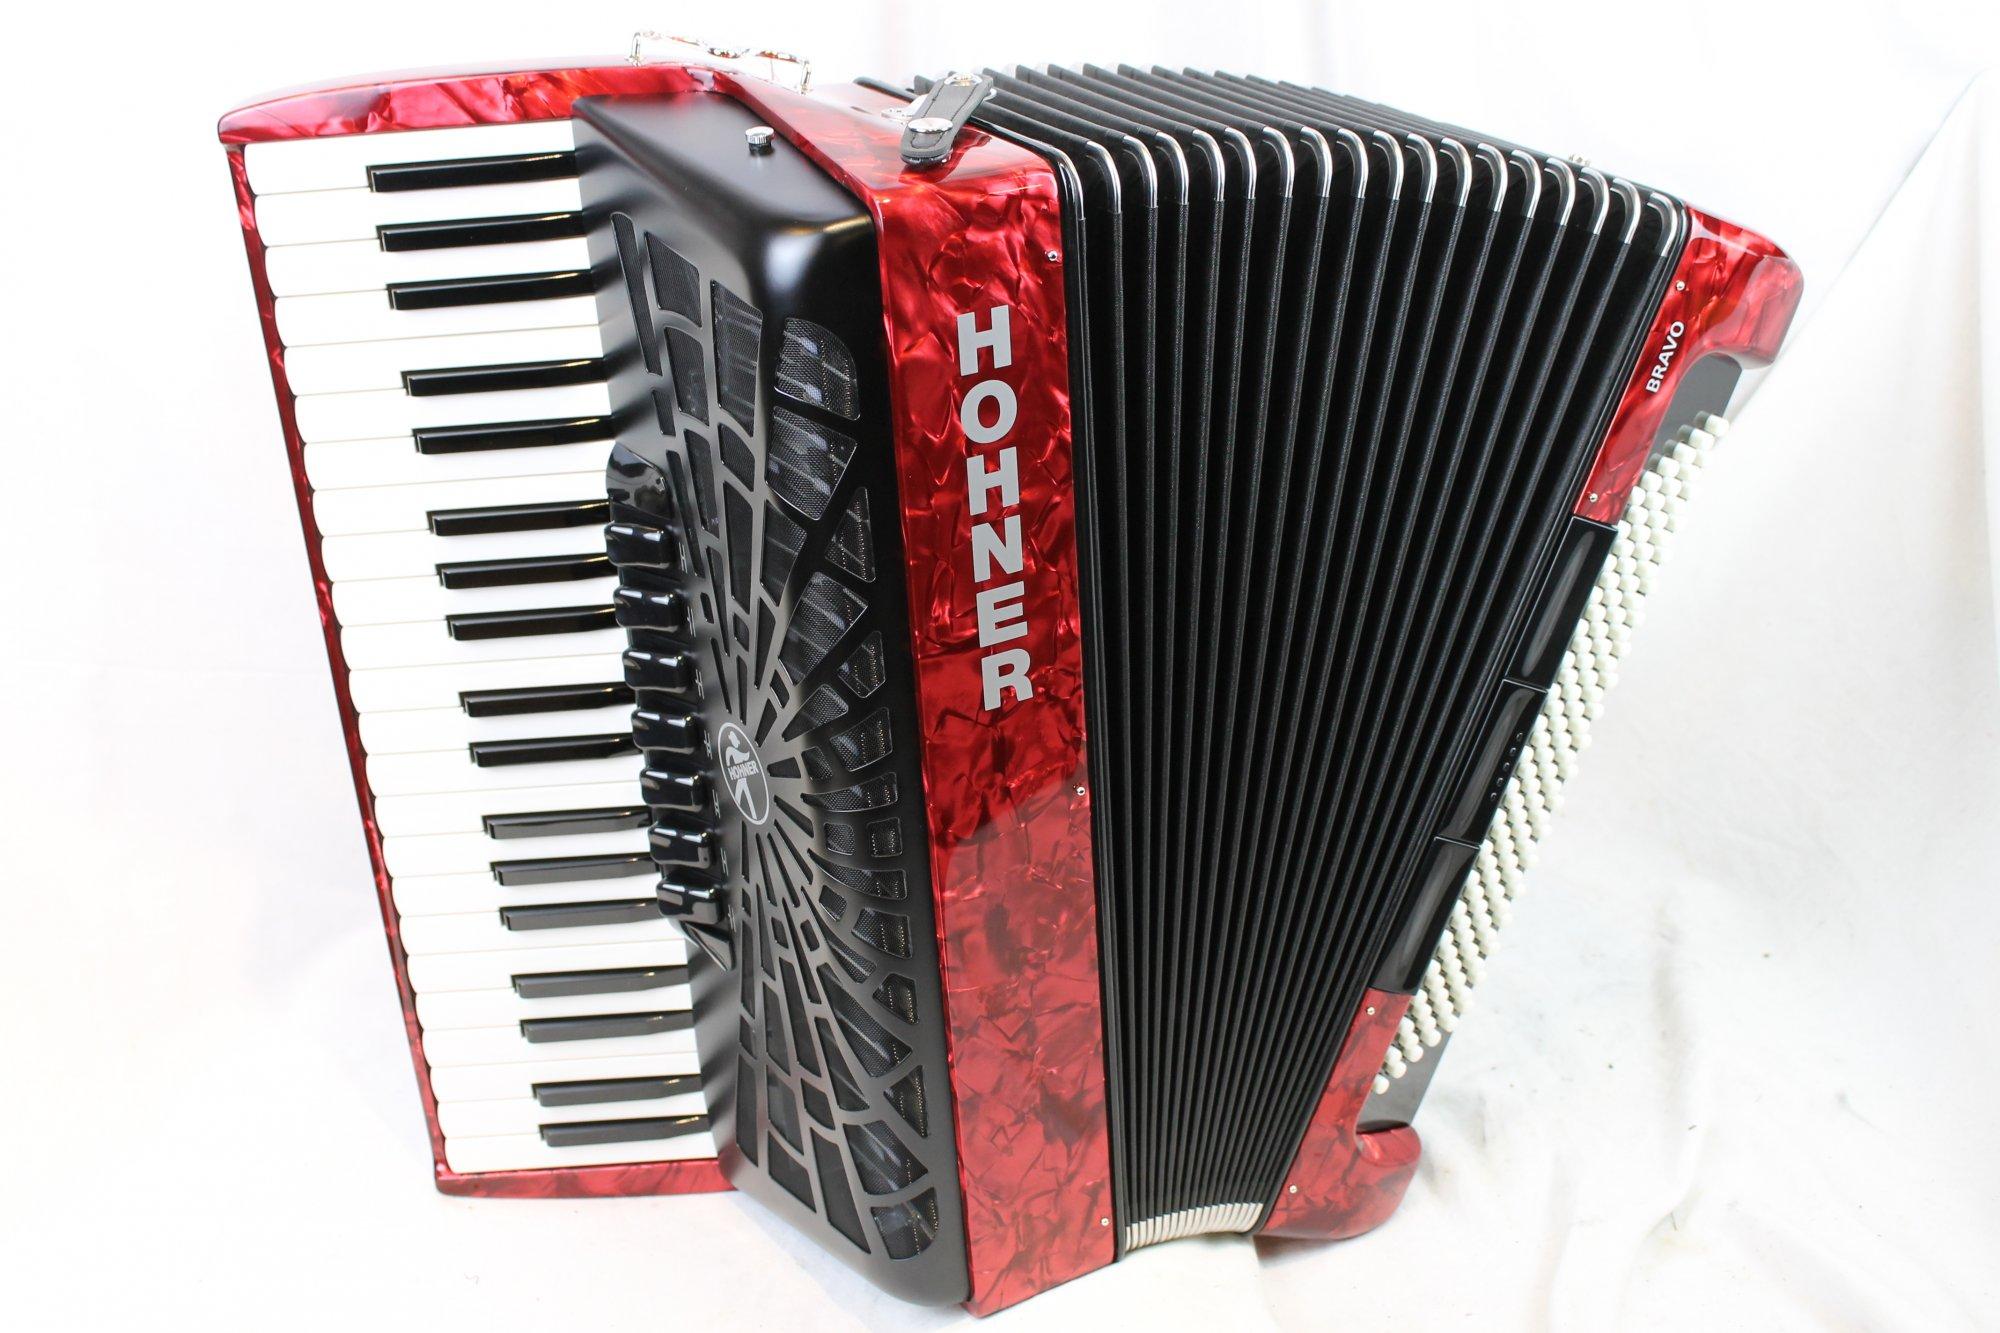 New Red Hohner Bravo III Piano Accordion LMM 41 120